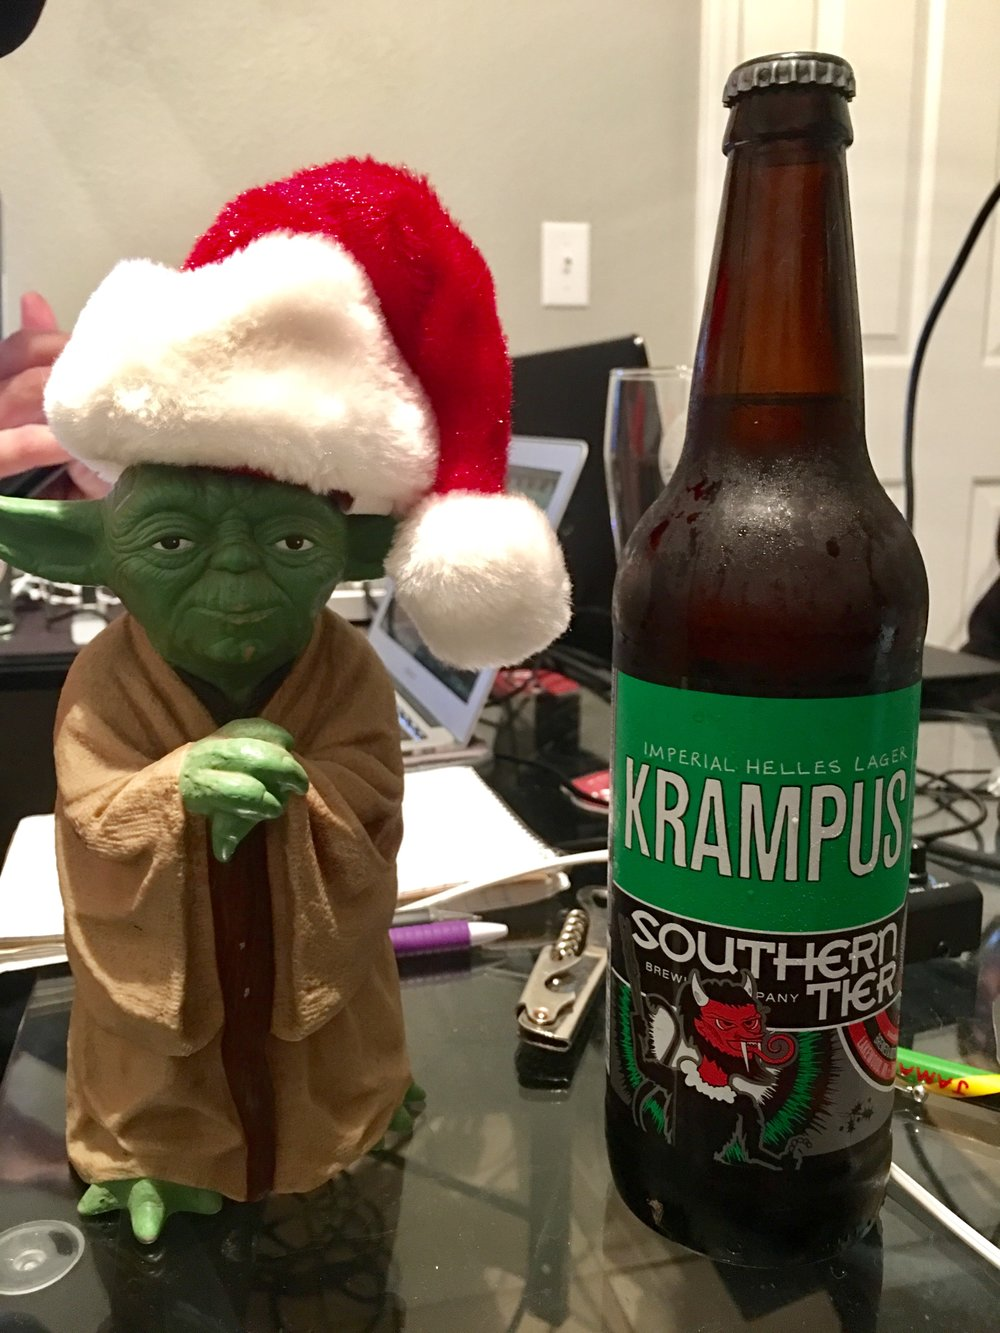 Santa Yoda is keeping us safe from Krampus.